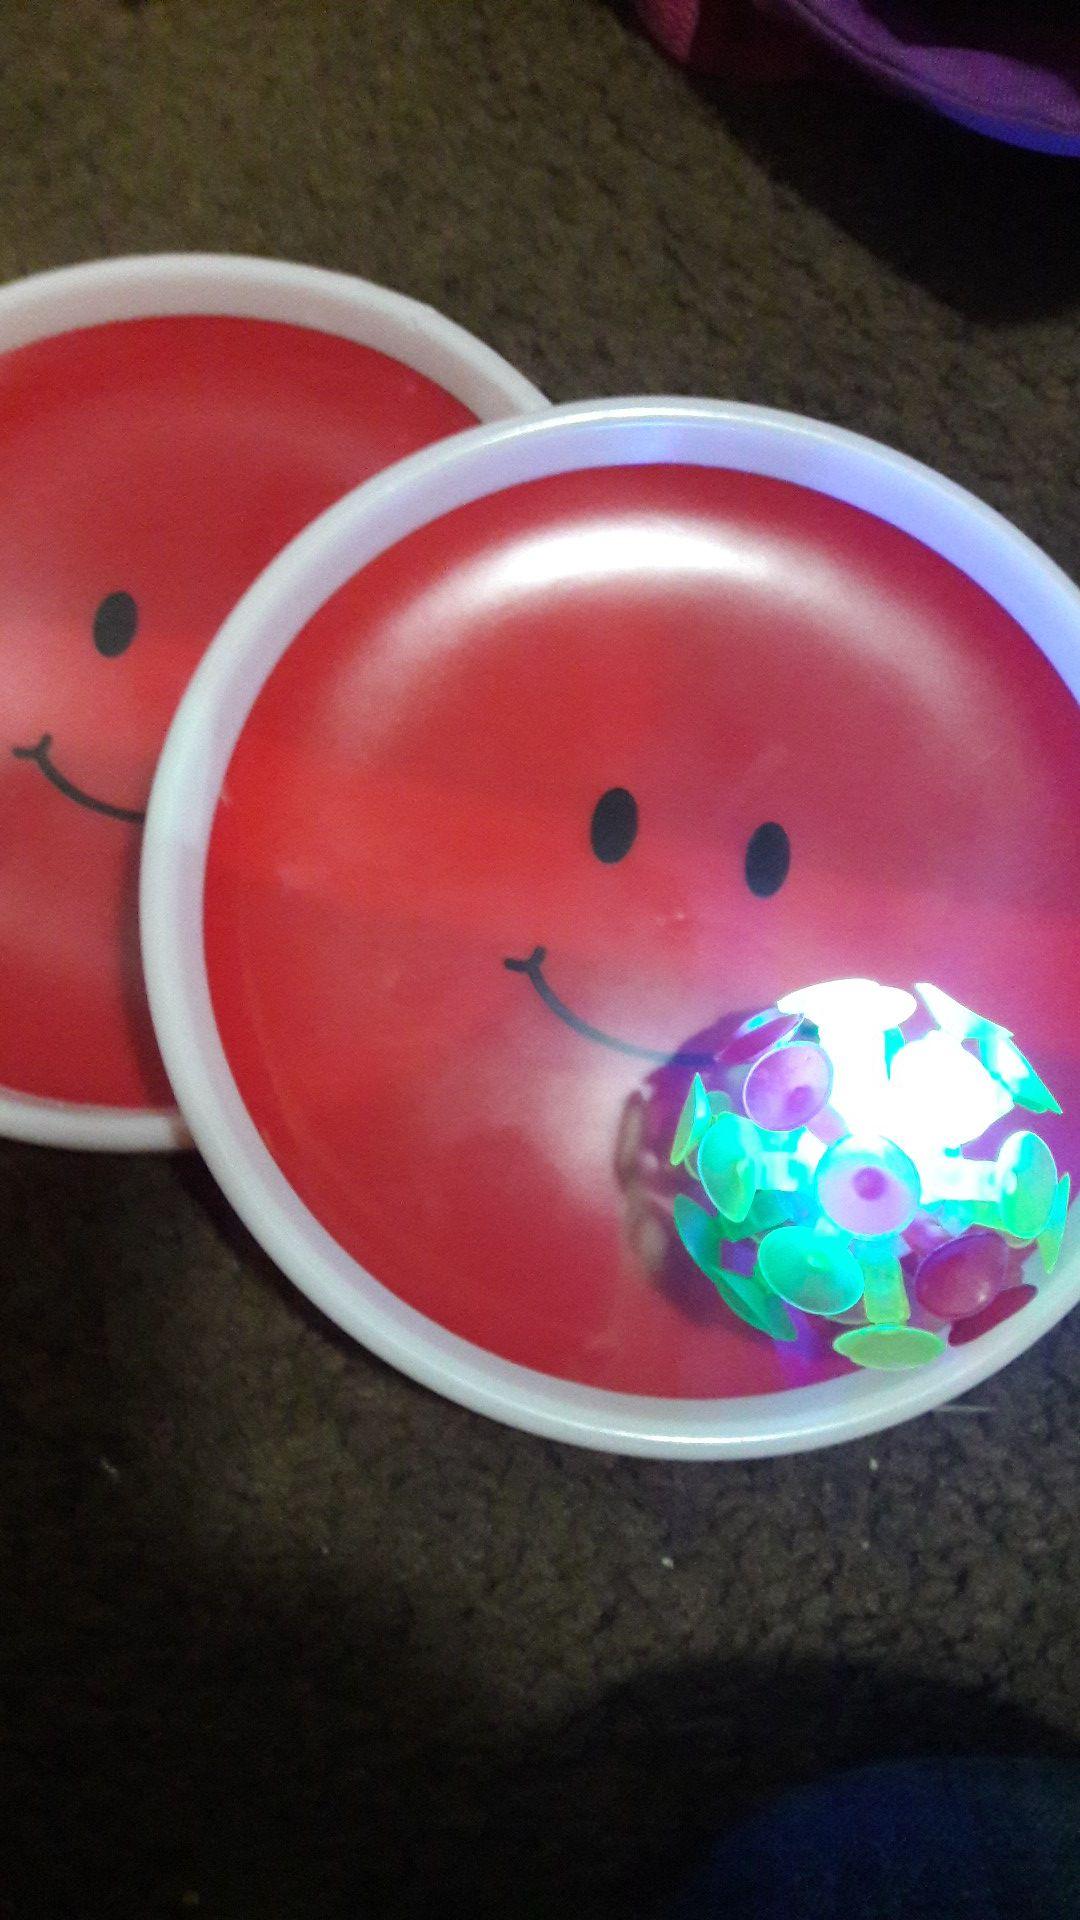 Light up ball caching